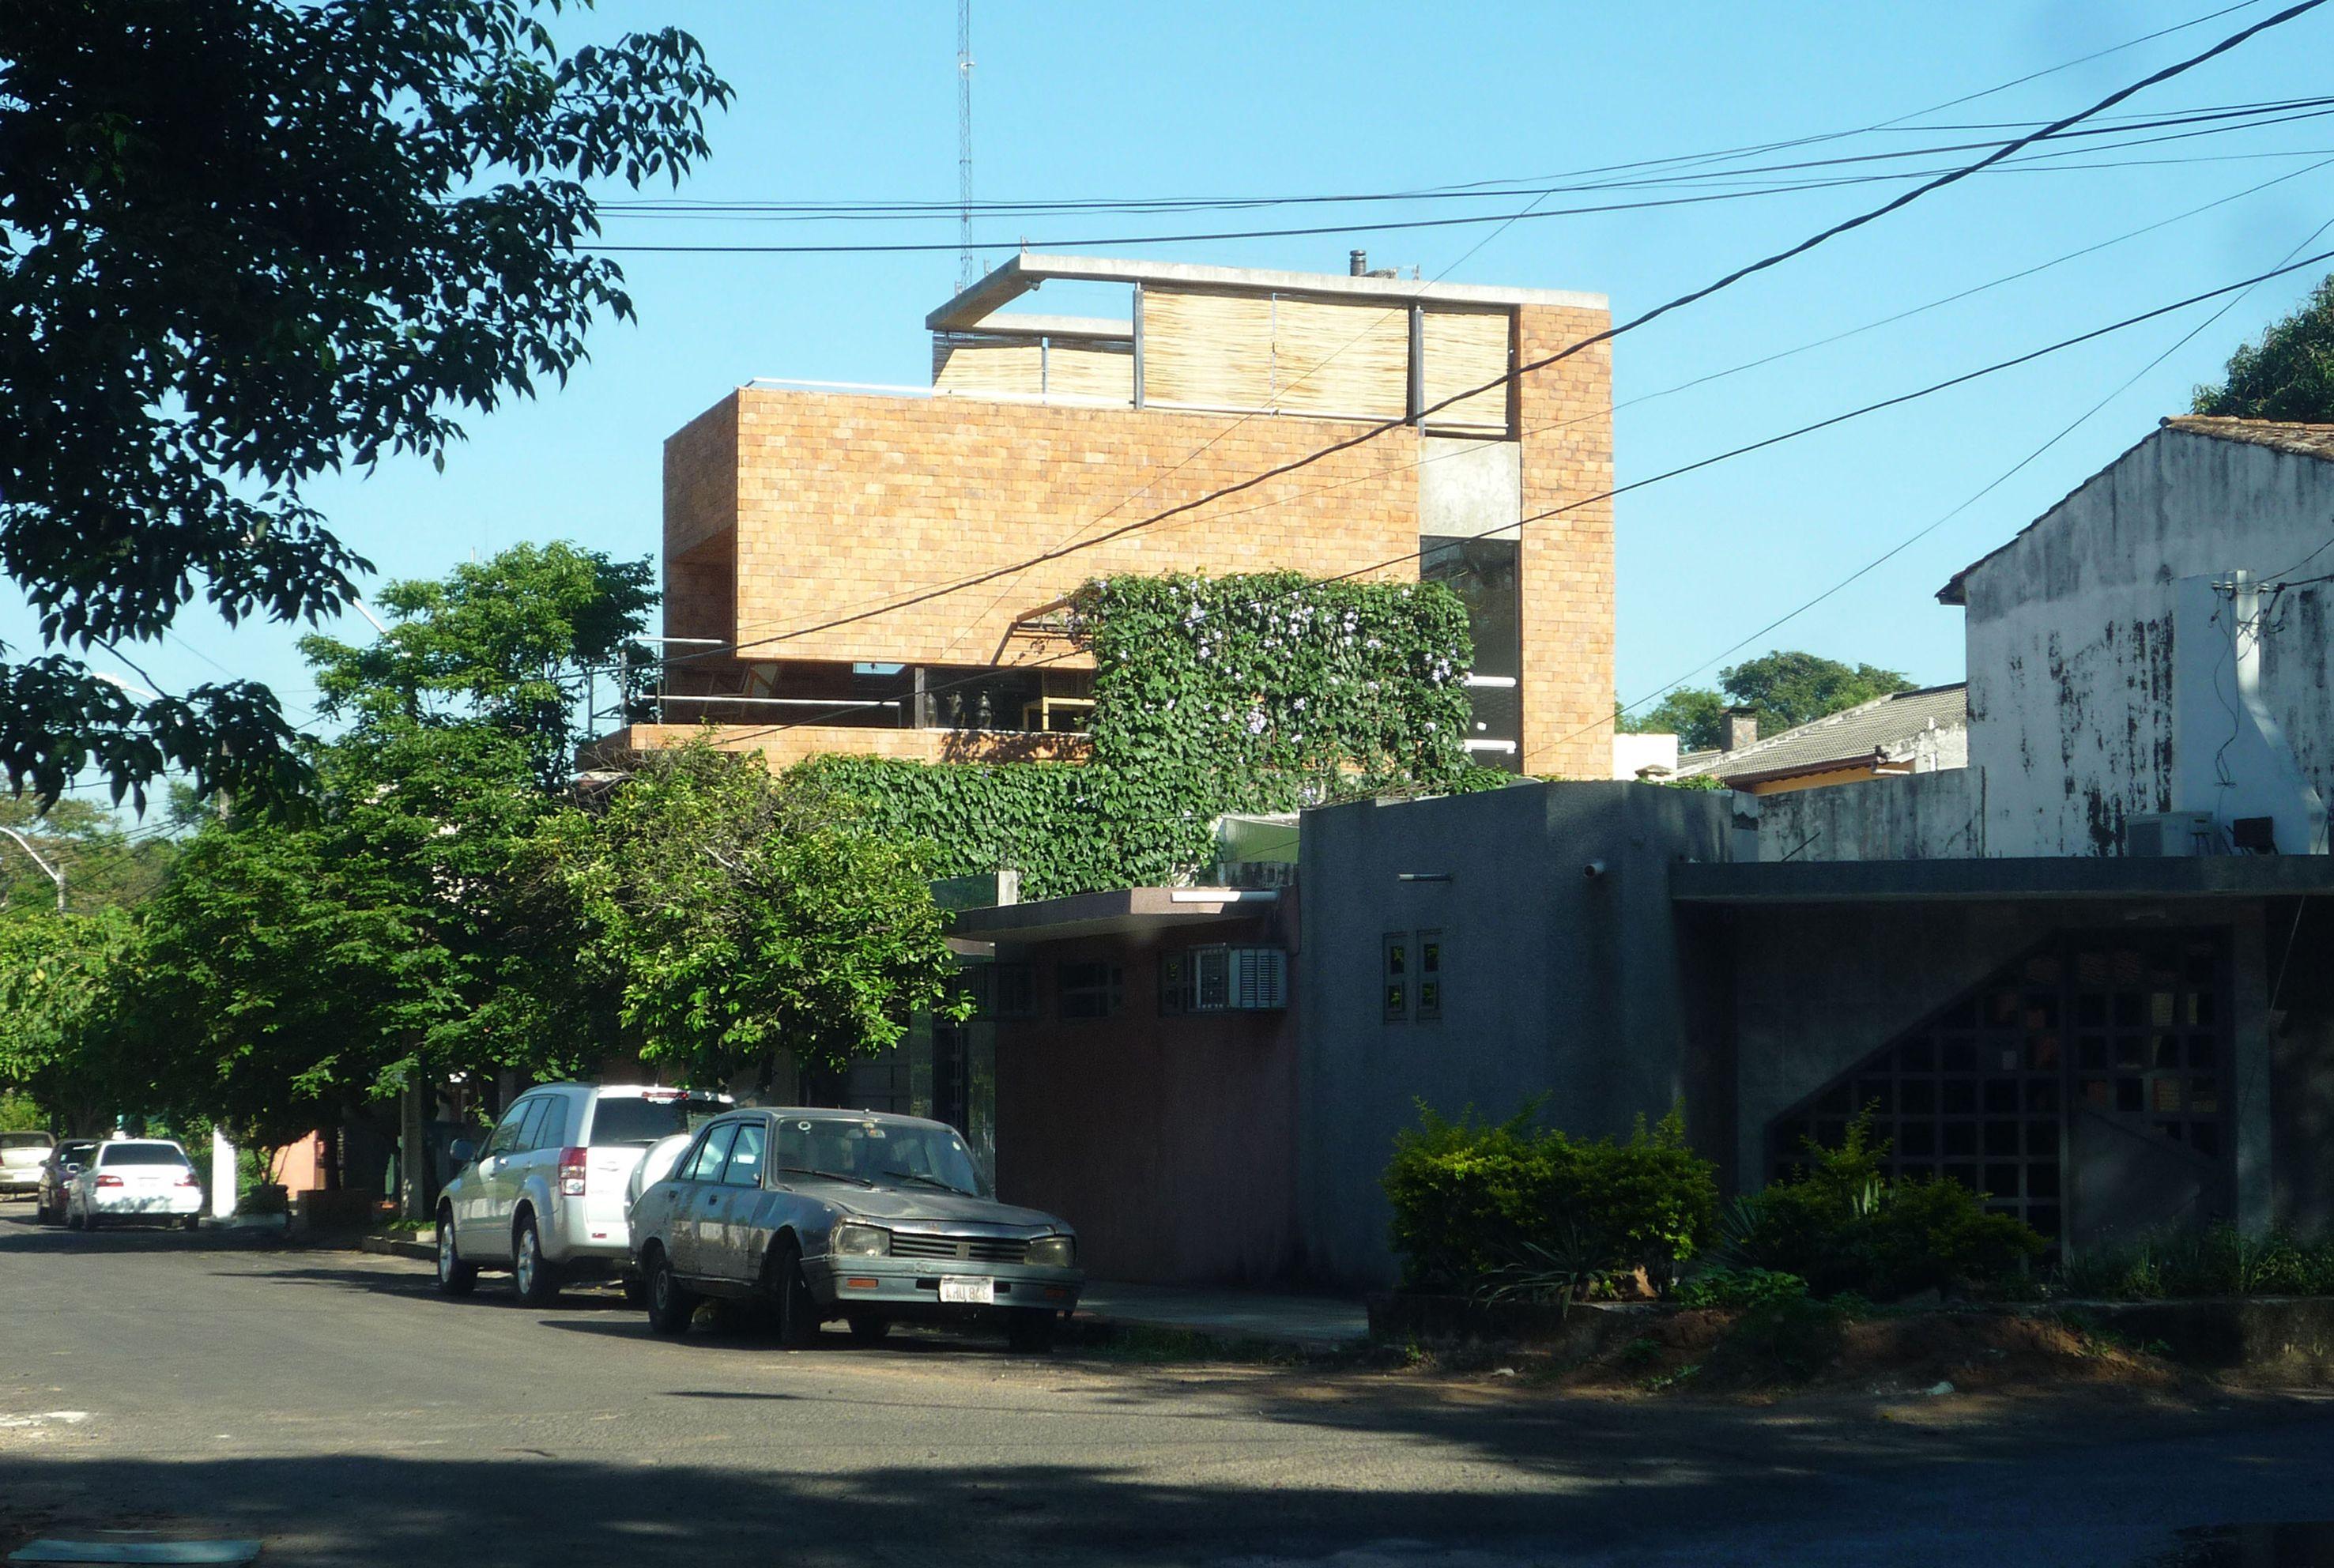 Galeria - Edifício Mburicao / Estudio ELGUE - 21